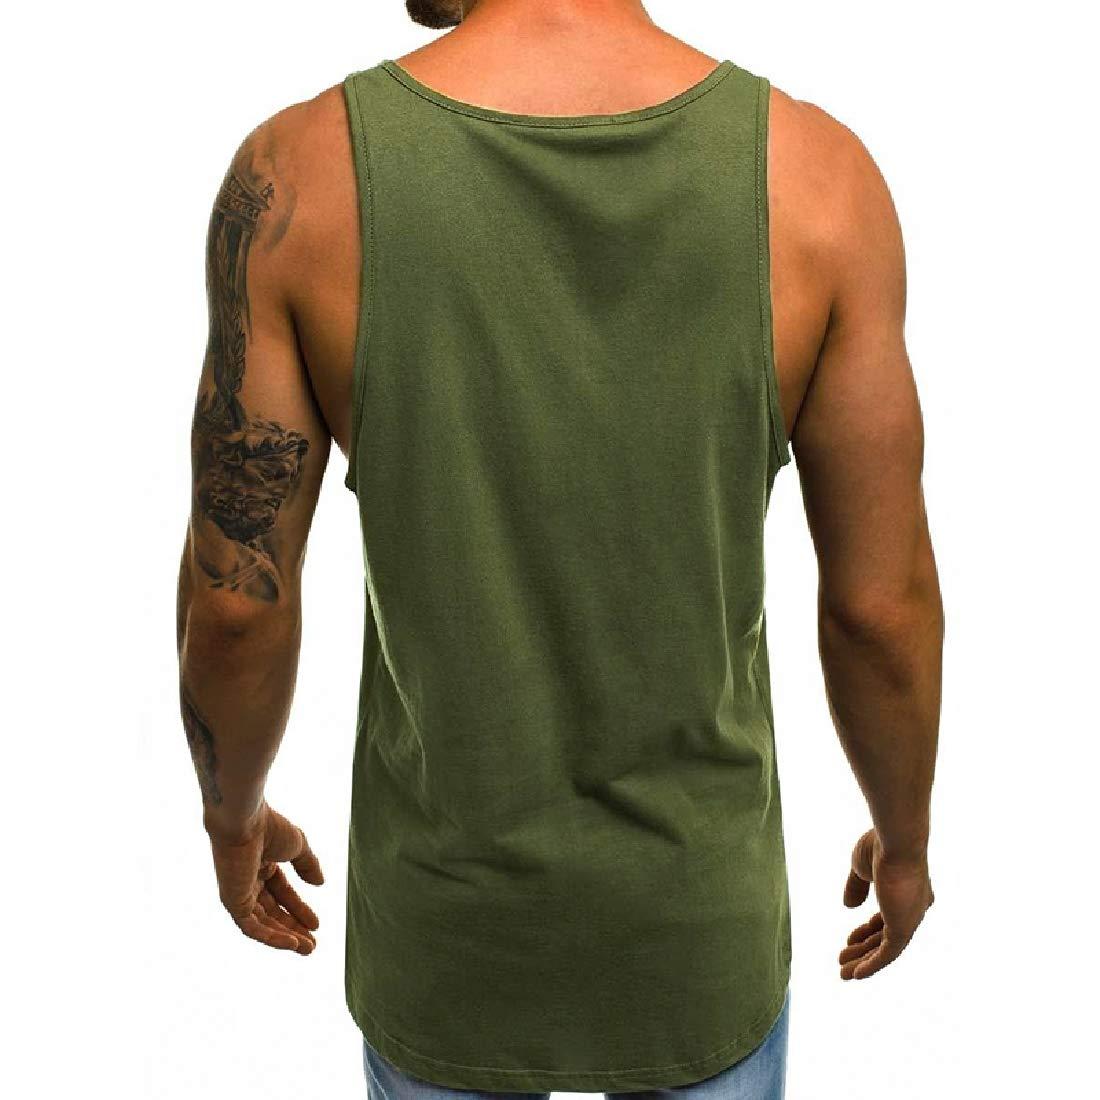 VITryst-Men Letter Printed Loose Sleeveless Crew-Neck Active Vest Tank Top